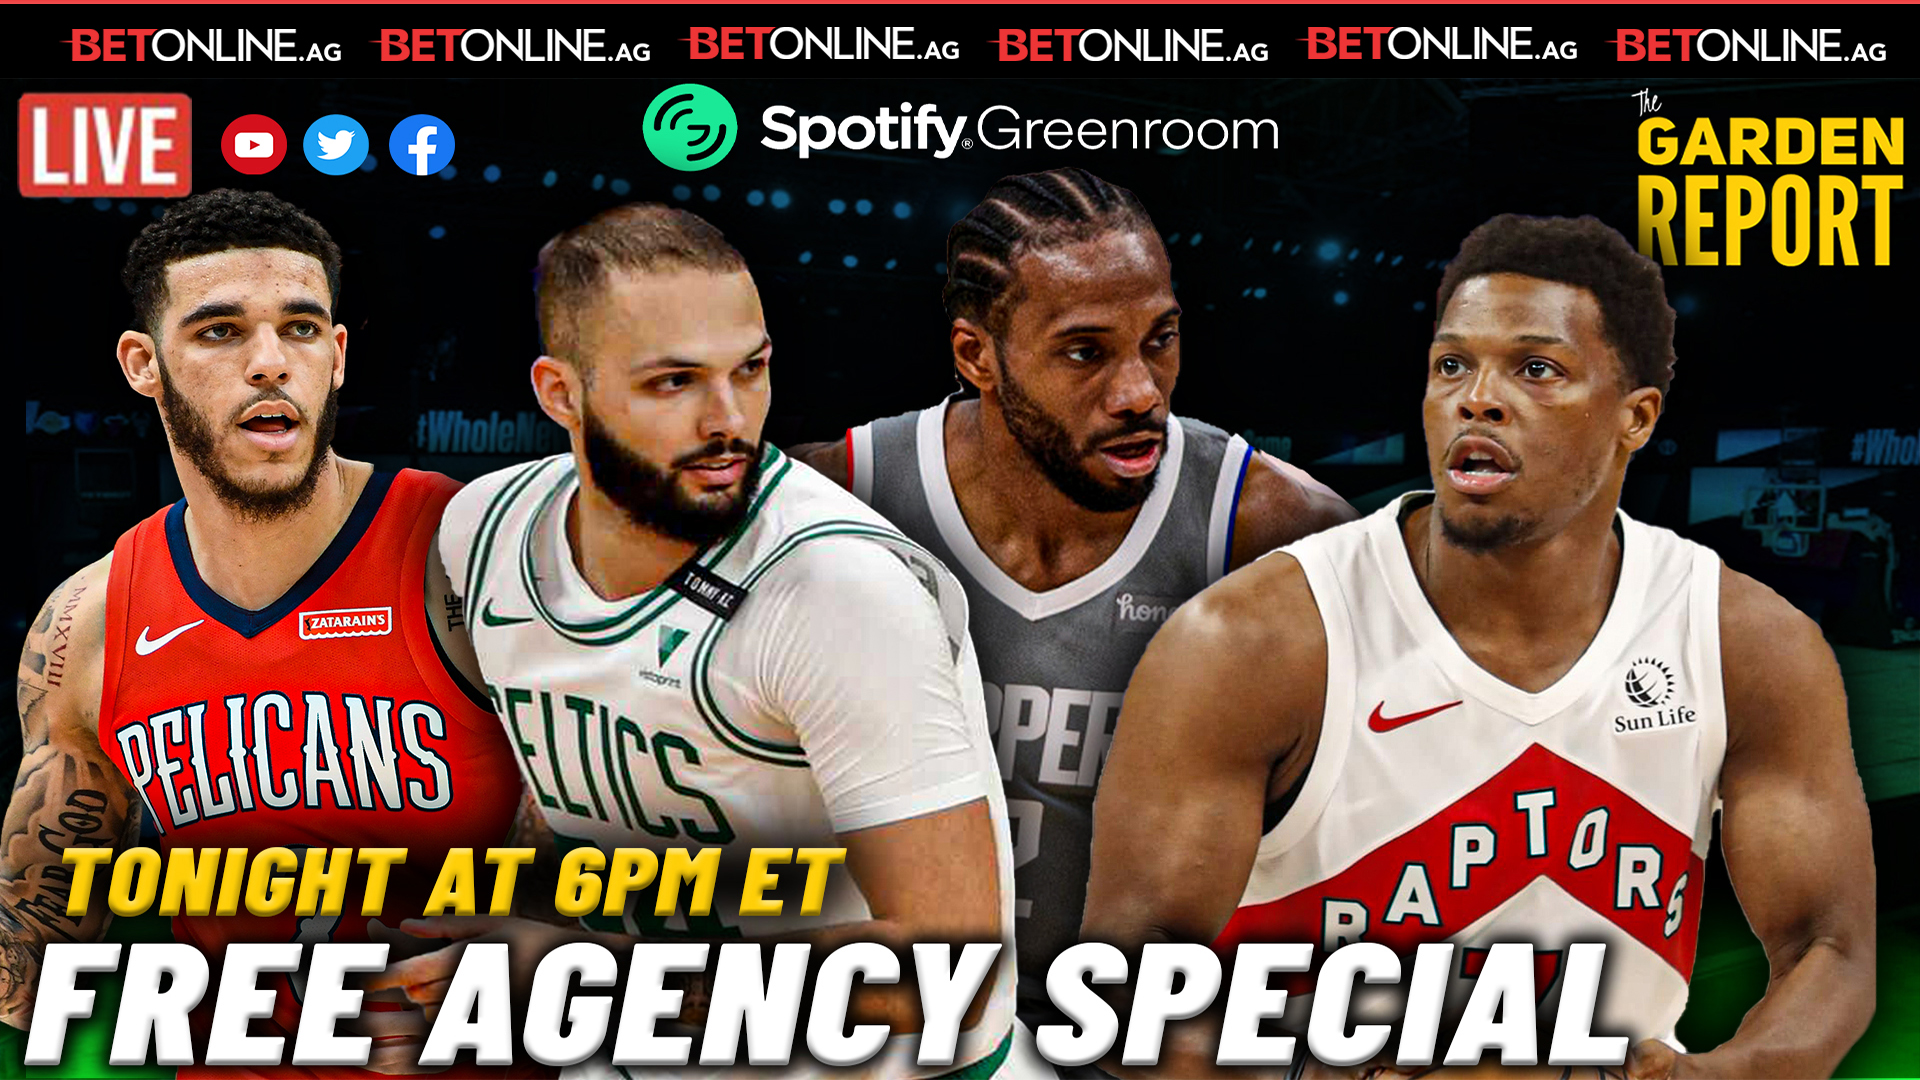 NBA Free Agency Special | Garden Report